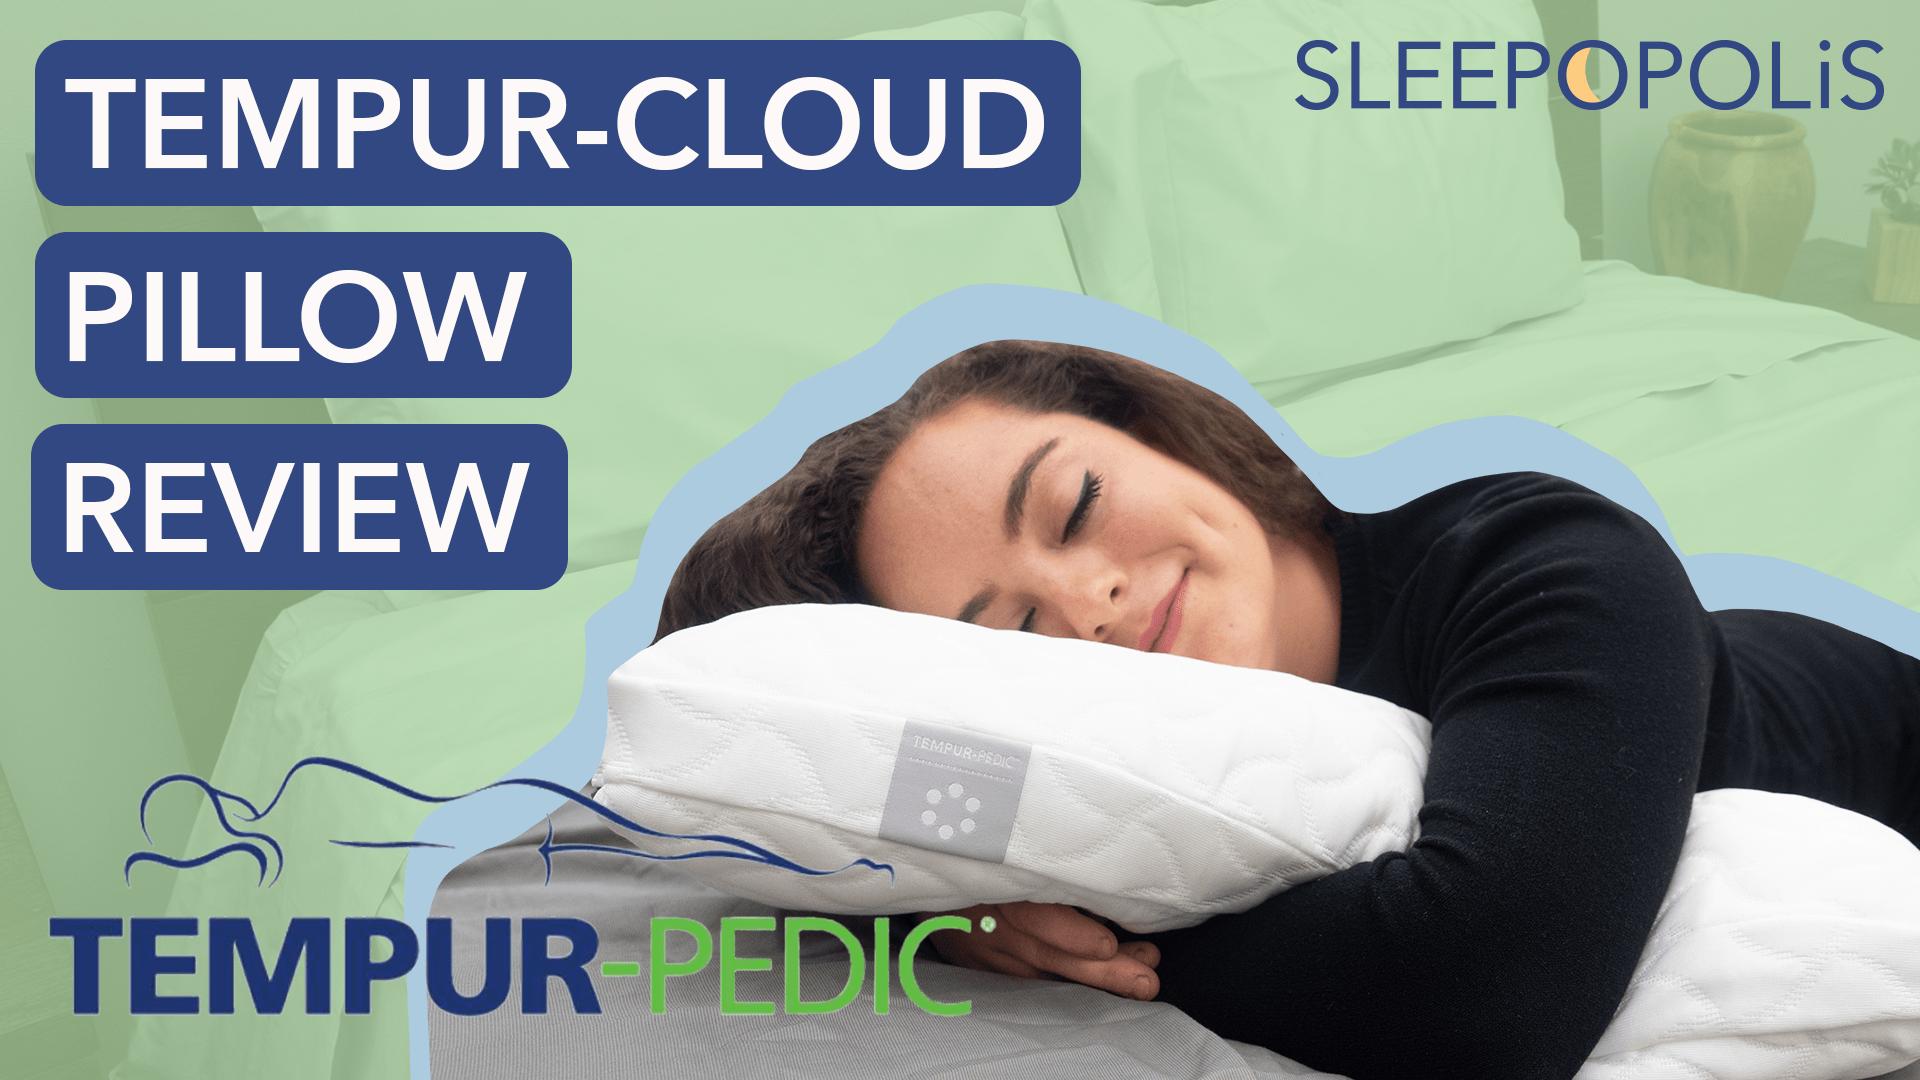 tempur cloud pillow review 2021